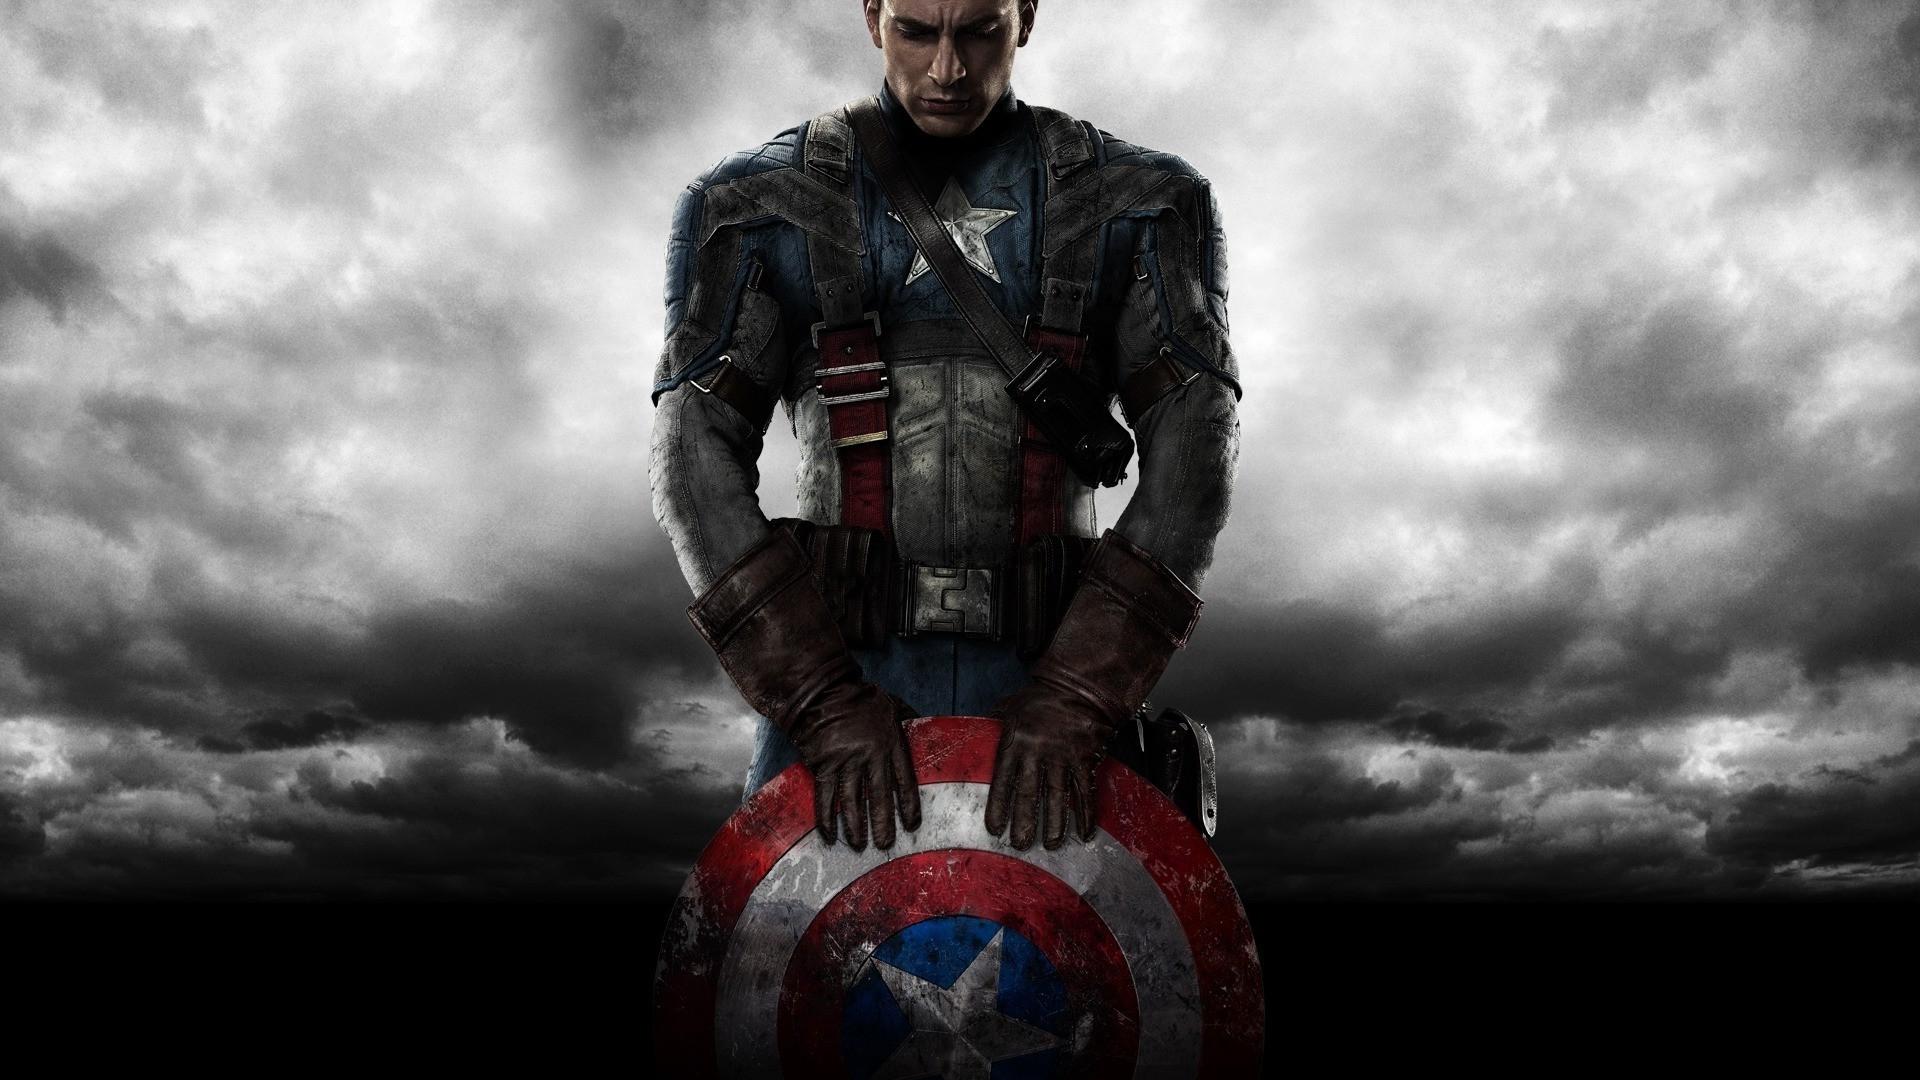 https://get.wallhere.com/photo/1920x1080-px-america-Avenger-captain-superhero-804996.jpg